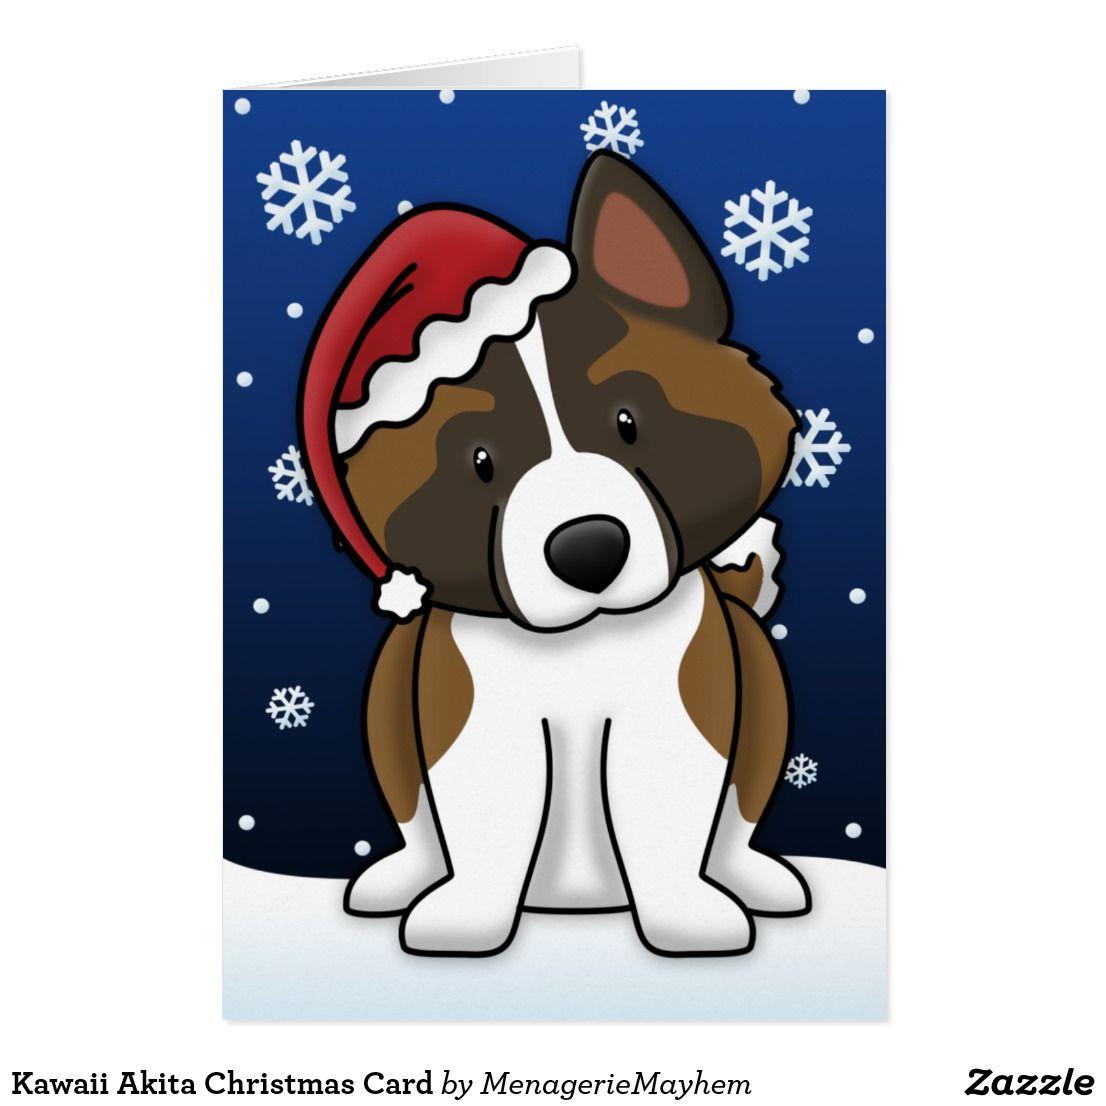 Kawaii Akita Weihnachtskarte Feiertagskarte  Zazzle.de  Akita